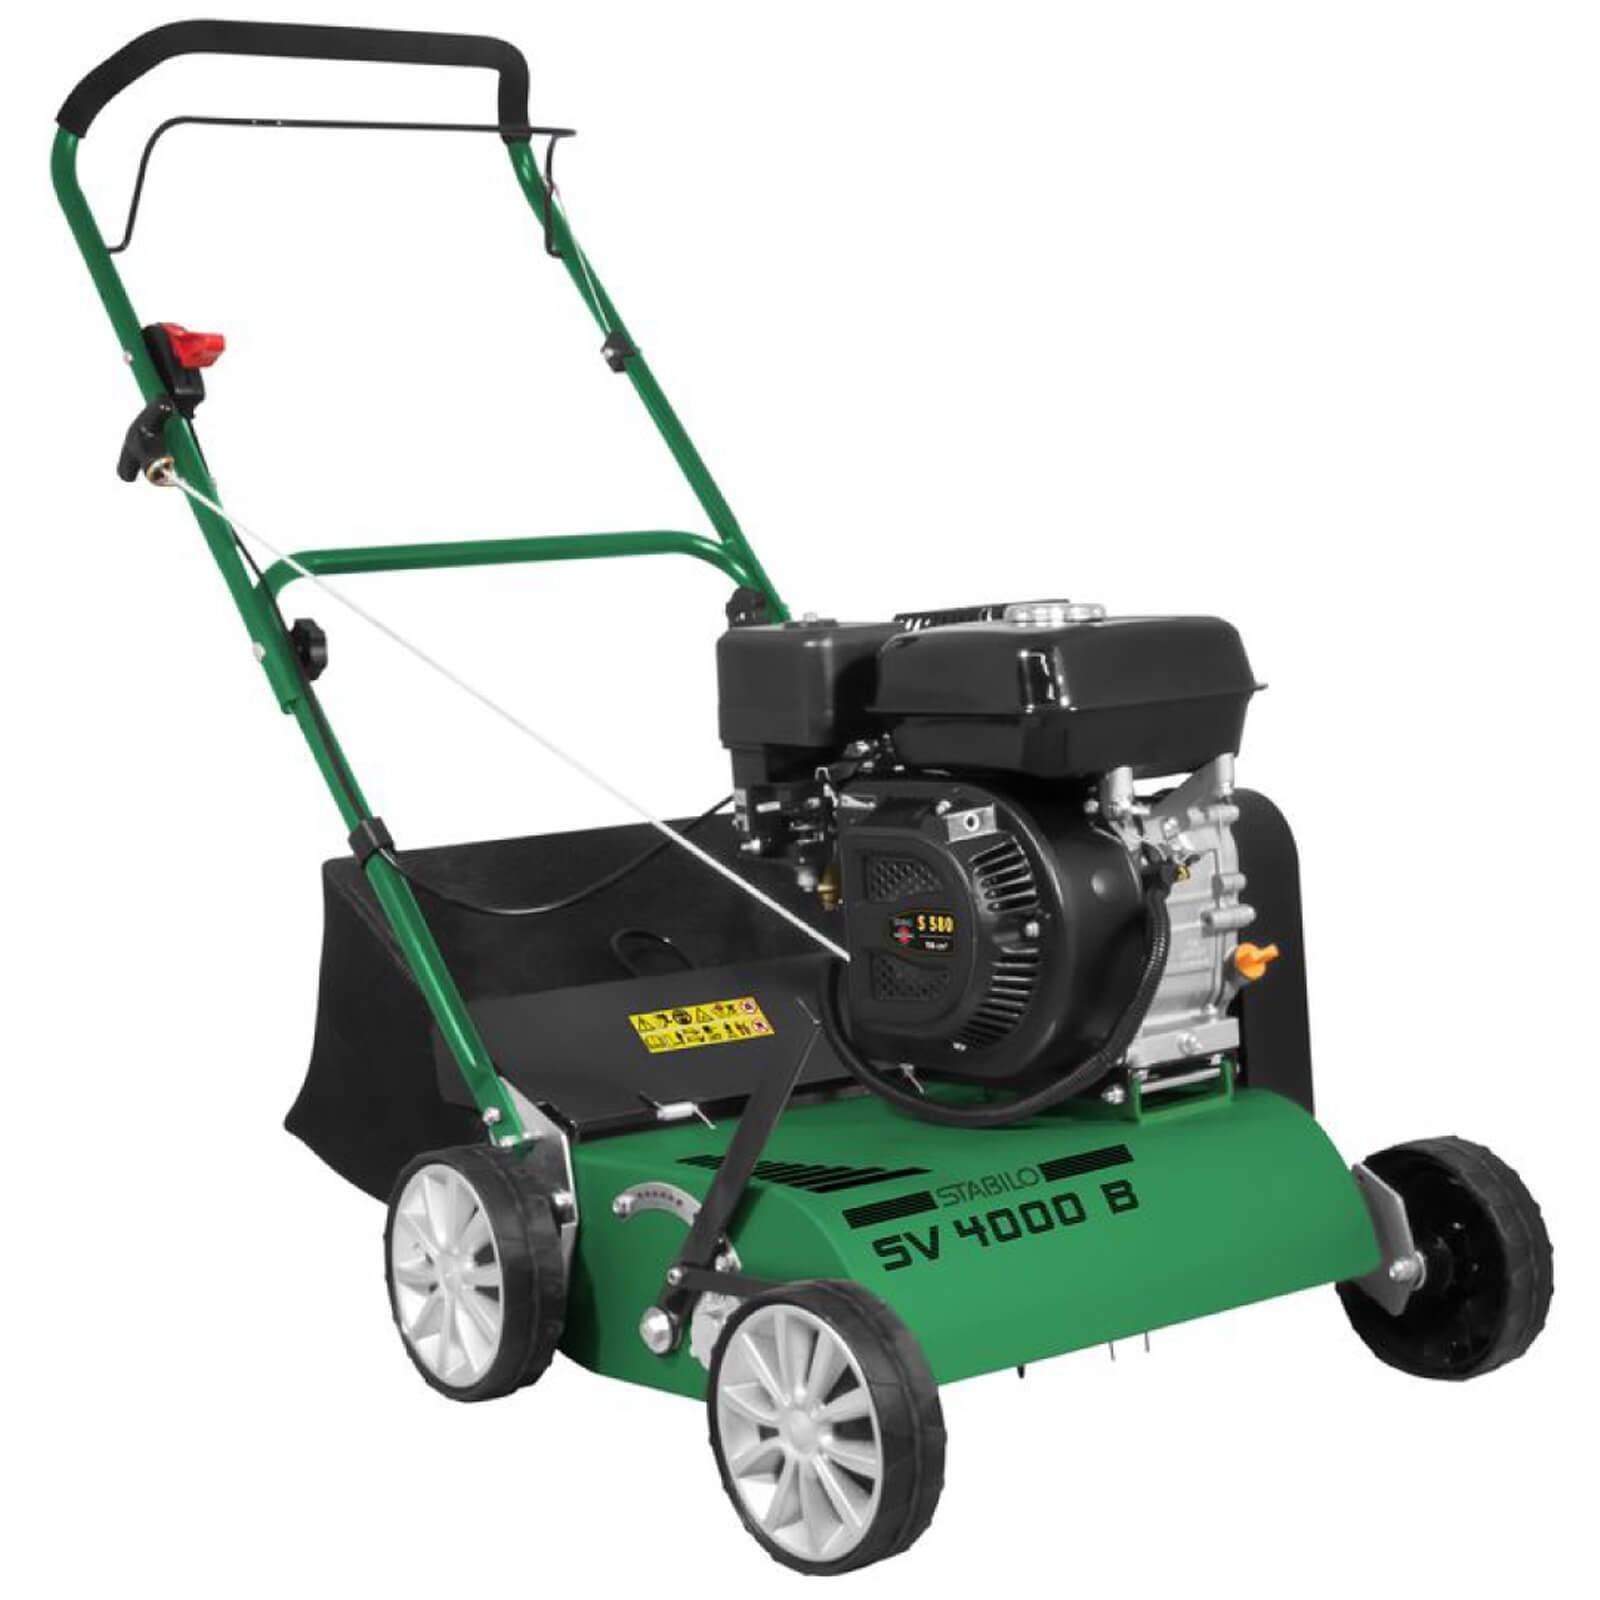 Stabilo Benzin Vertikutierer 3,8kW (5,2 PS) Rasenlüfter SV 4000 B 05134